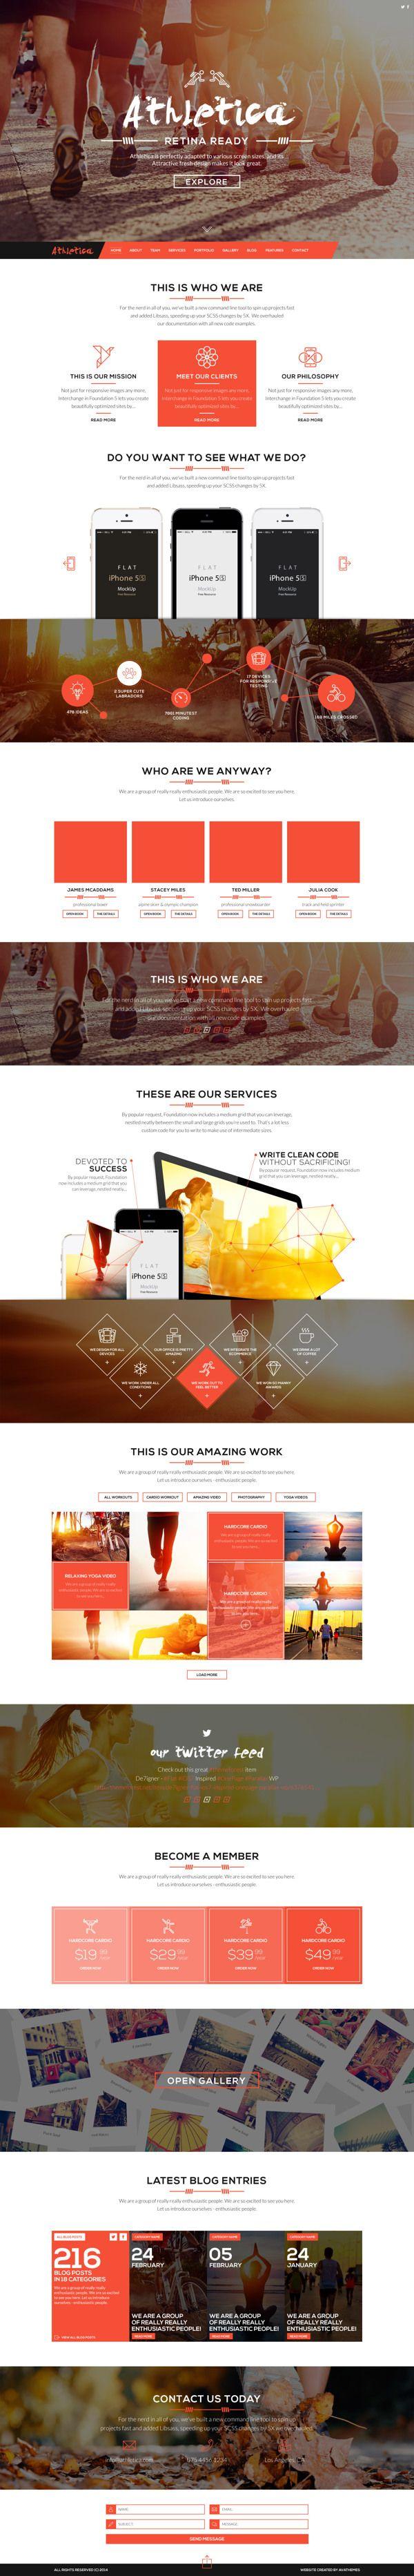 Cool Web Design on the Internet. Athletica. #webdesign #webdevelopment #website